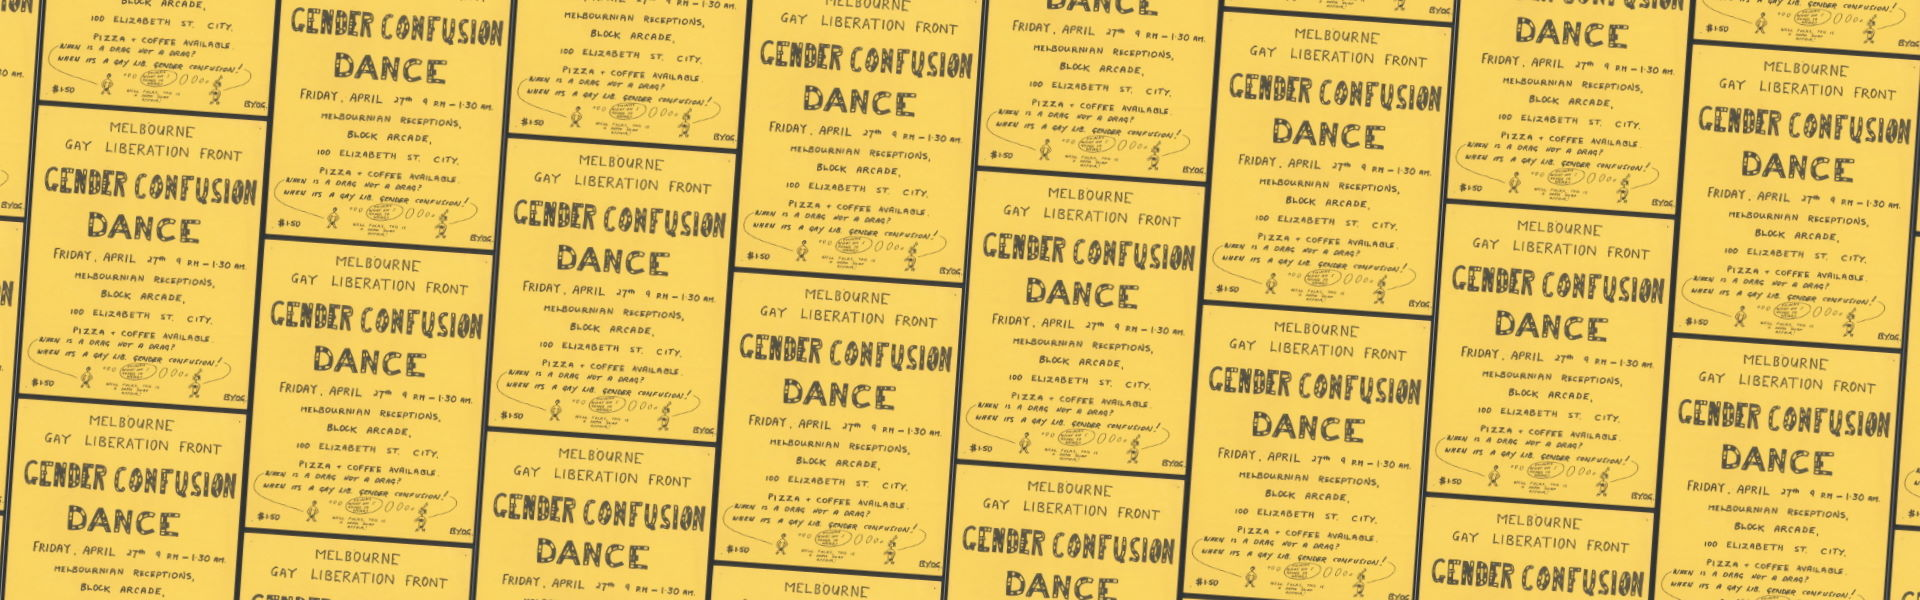 Gender Confusion Dance, Melbournian Receptions, Block Arcade, Friday 27 April (Melbourne, [1973])-Banner Web